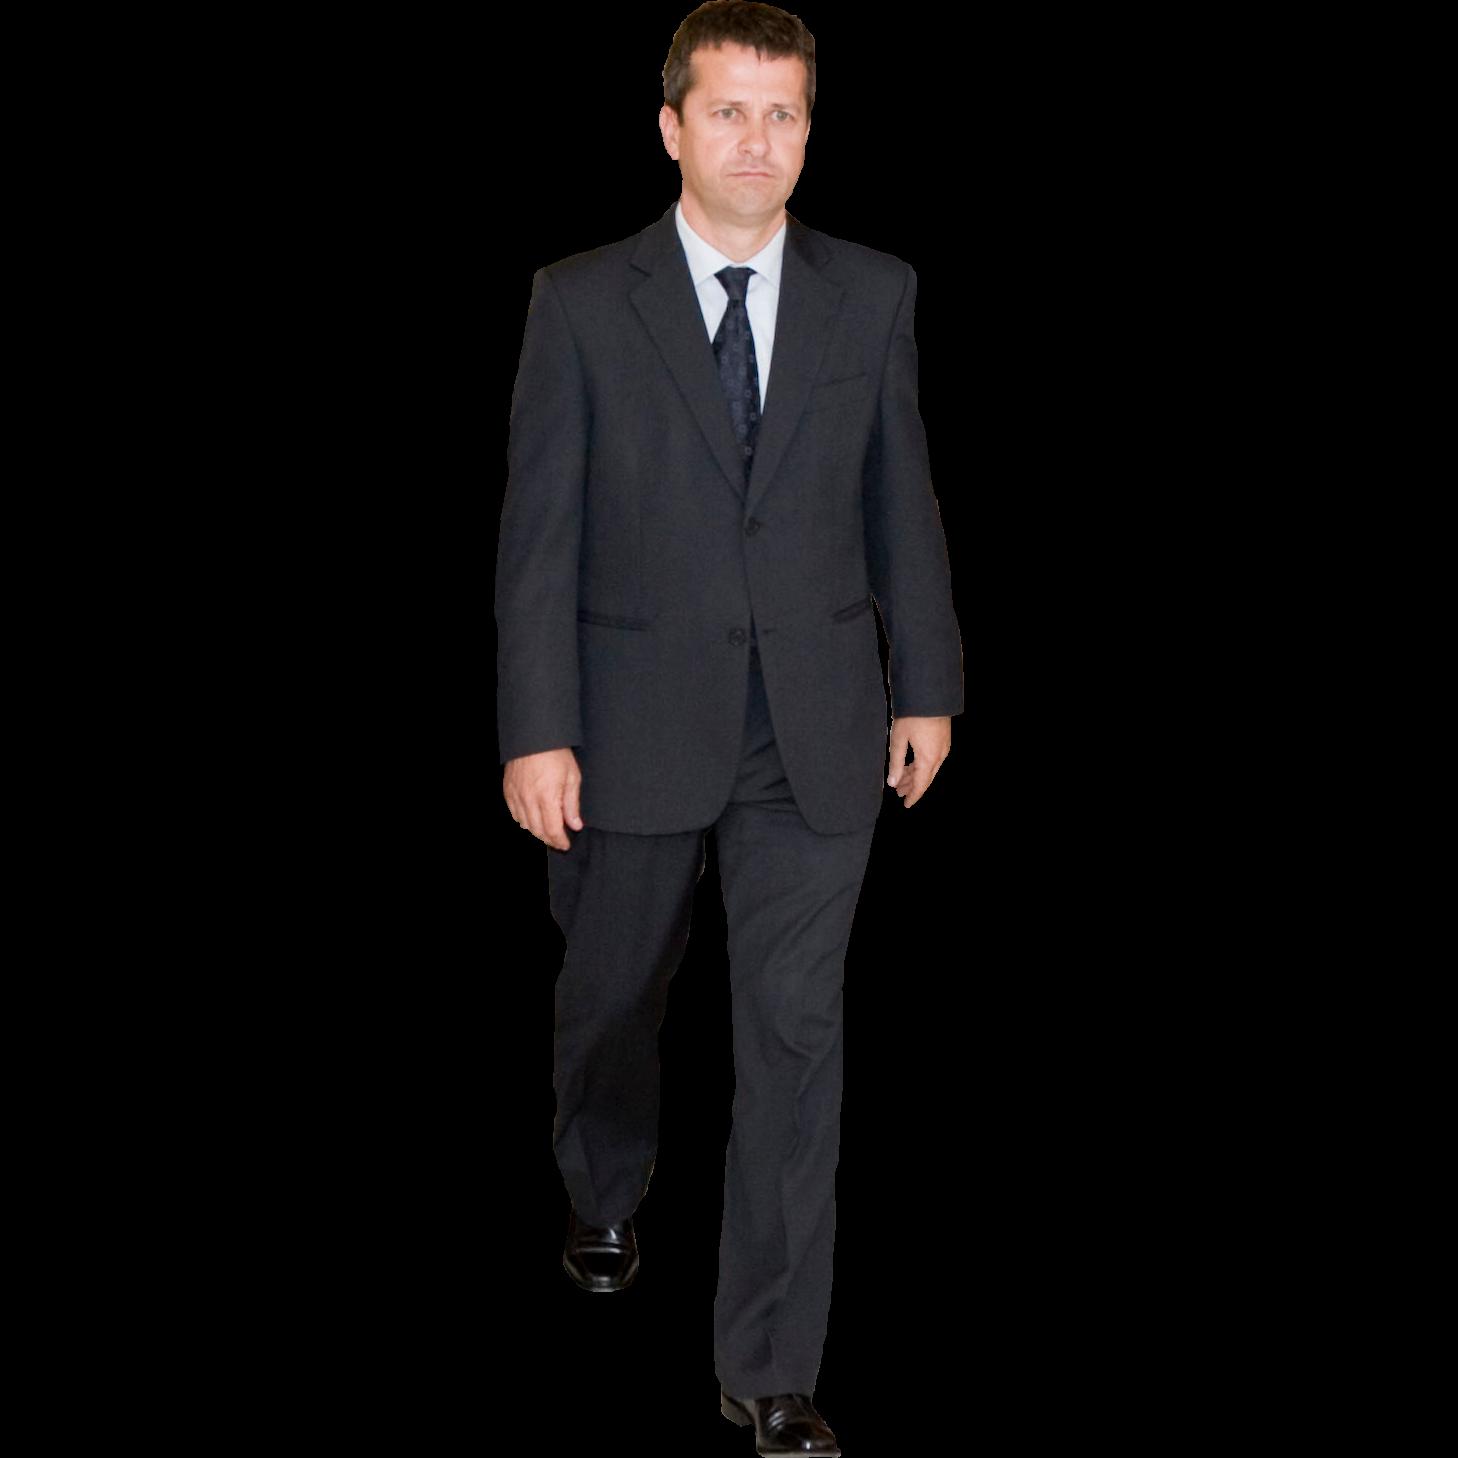 Suit PNG Transparent Image - Person In A Suit PNG